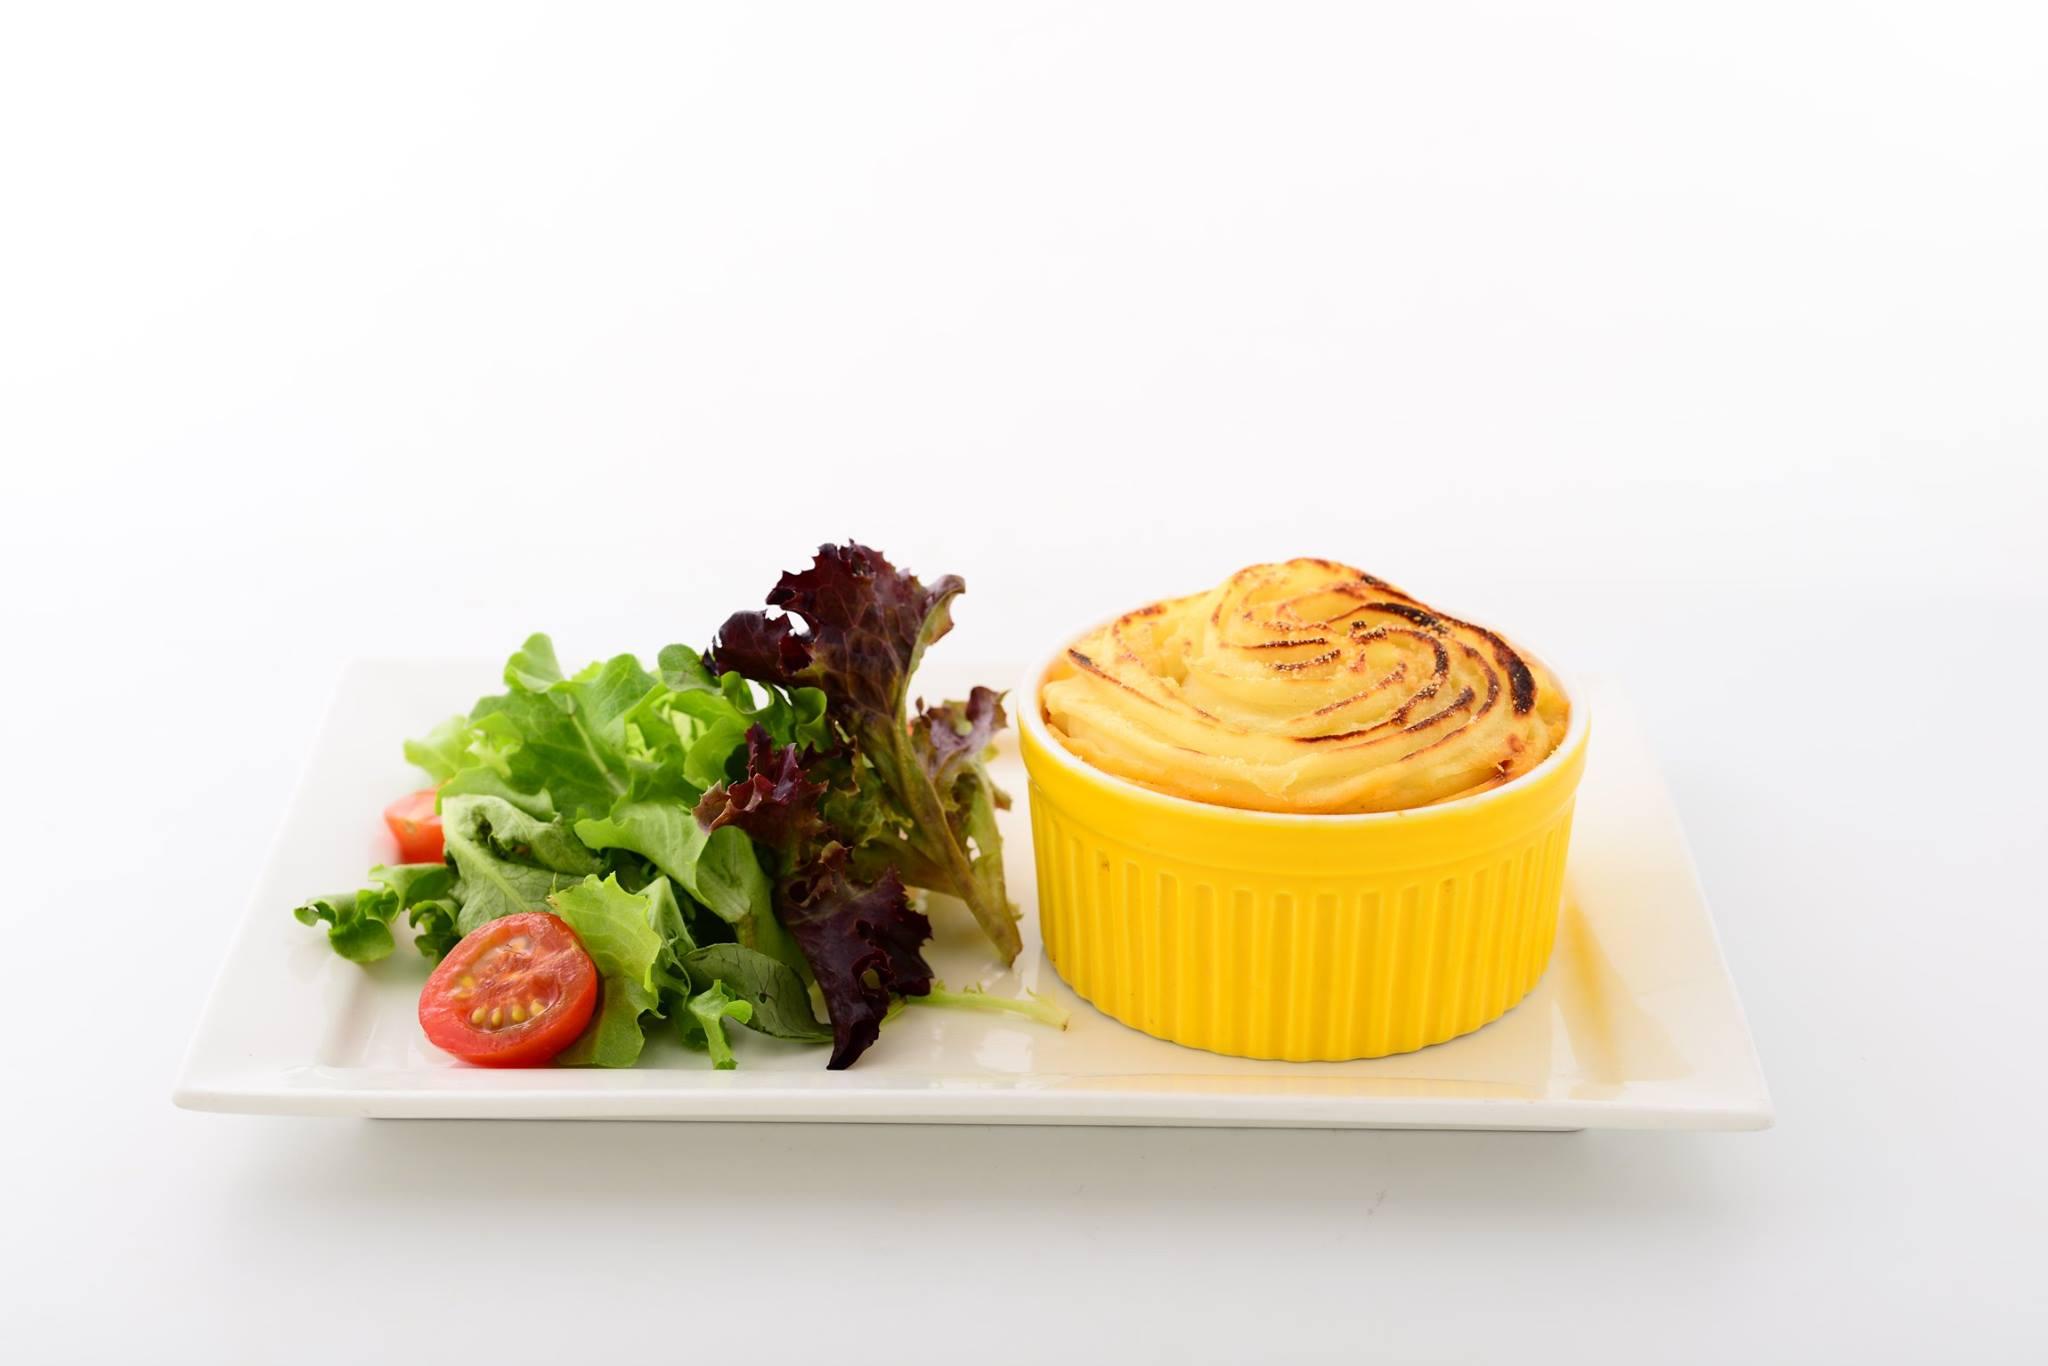 the royals cafe shepherd's pie